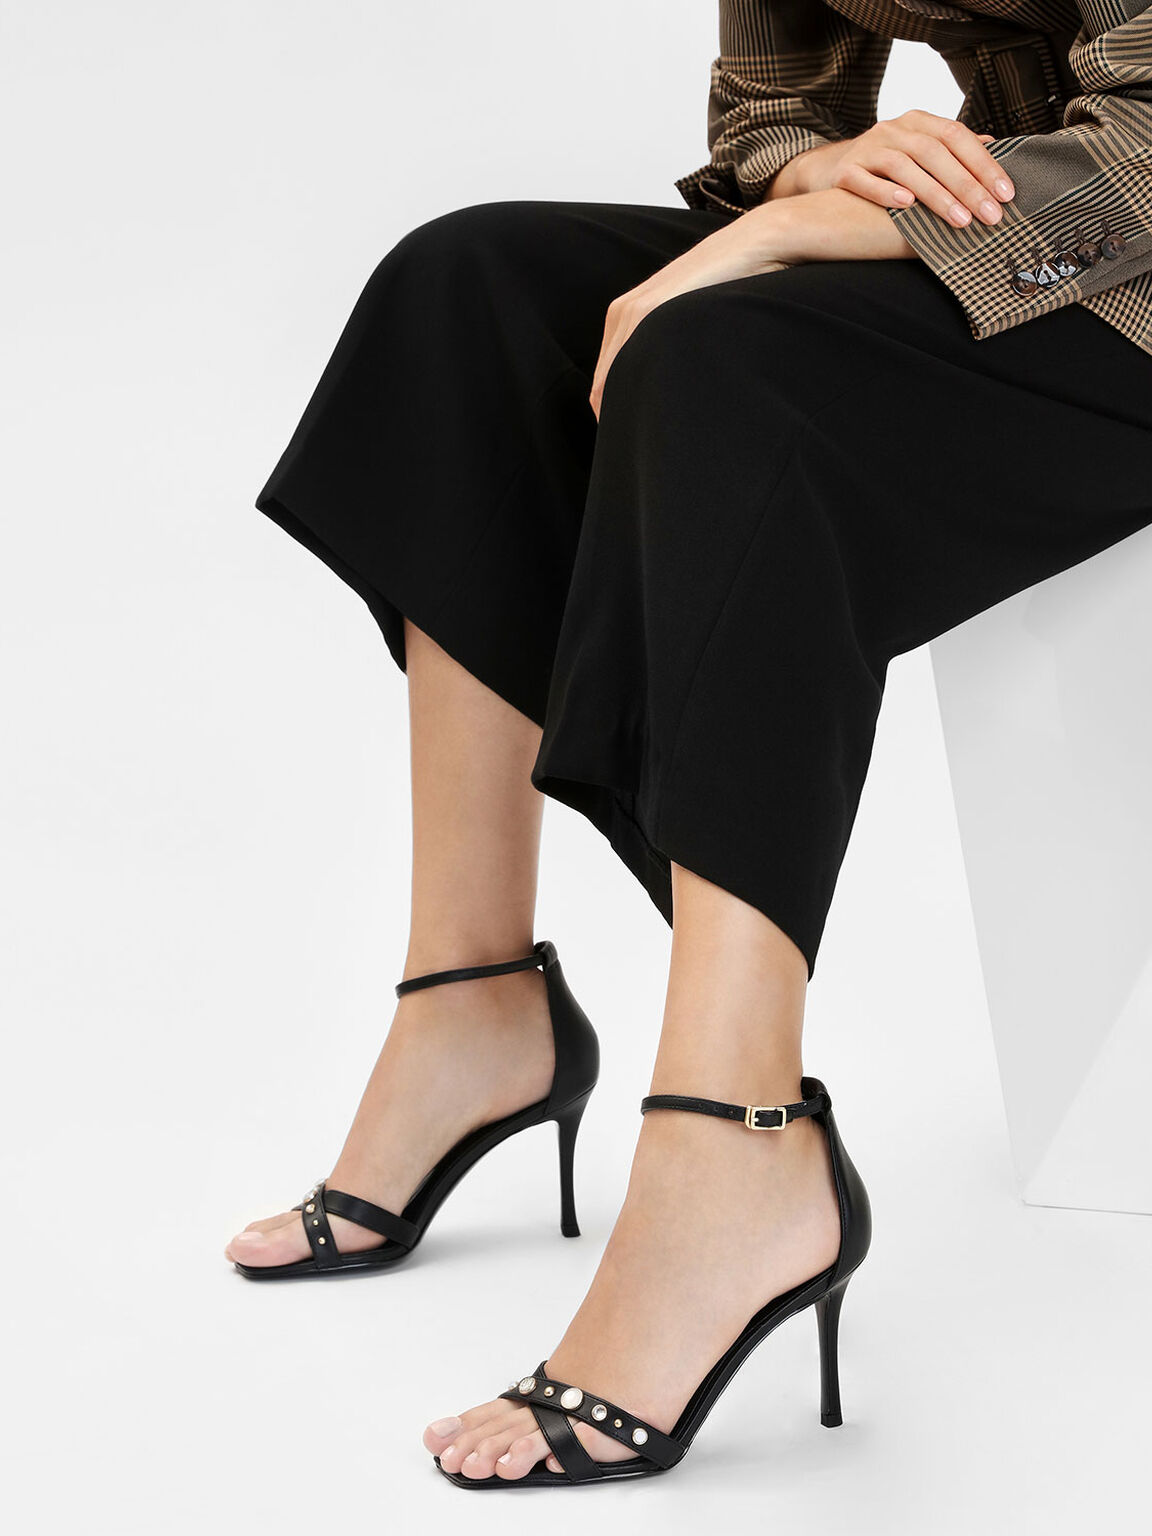 寶石交叉帶涼鞋, 黑色, hi-res